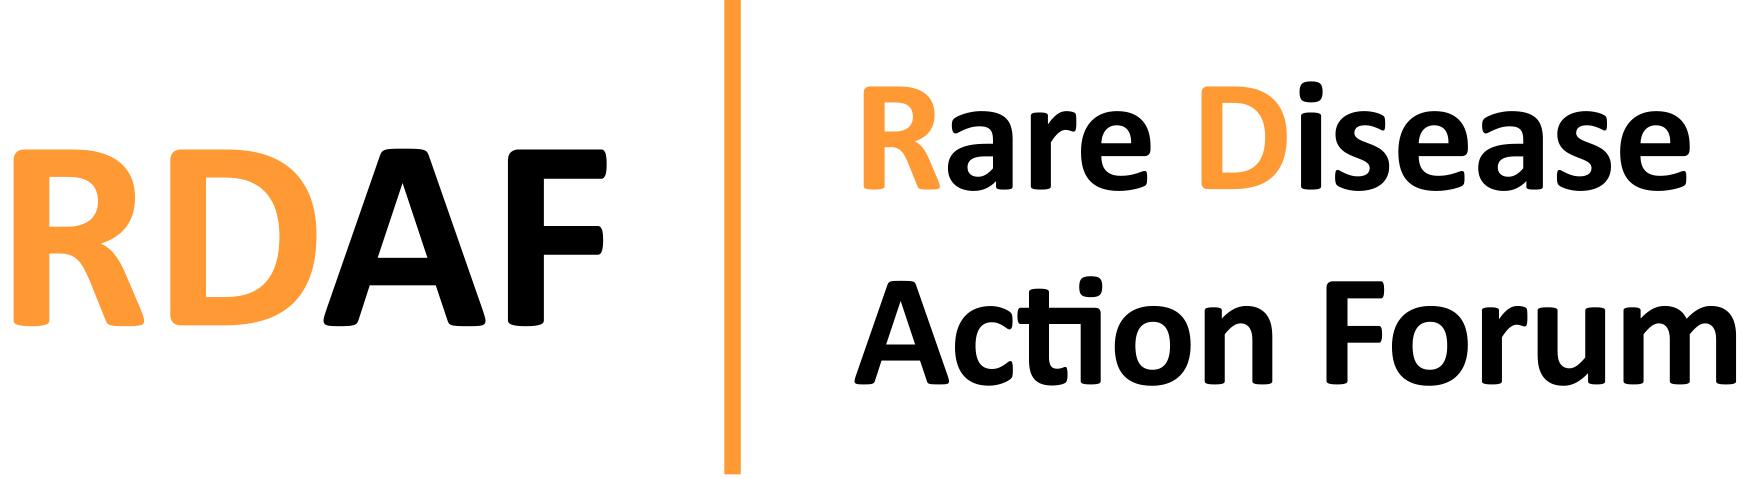 Rare Disease Action Forum